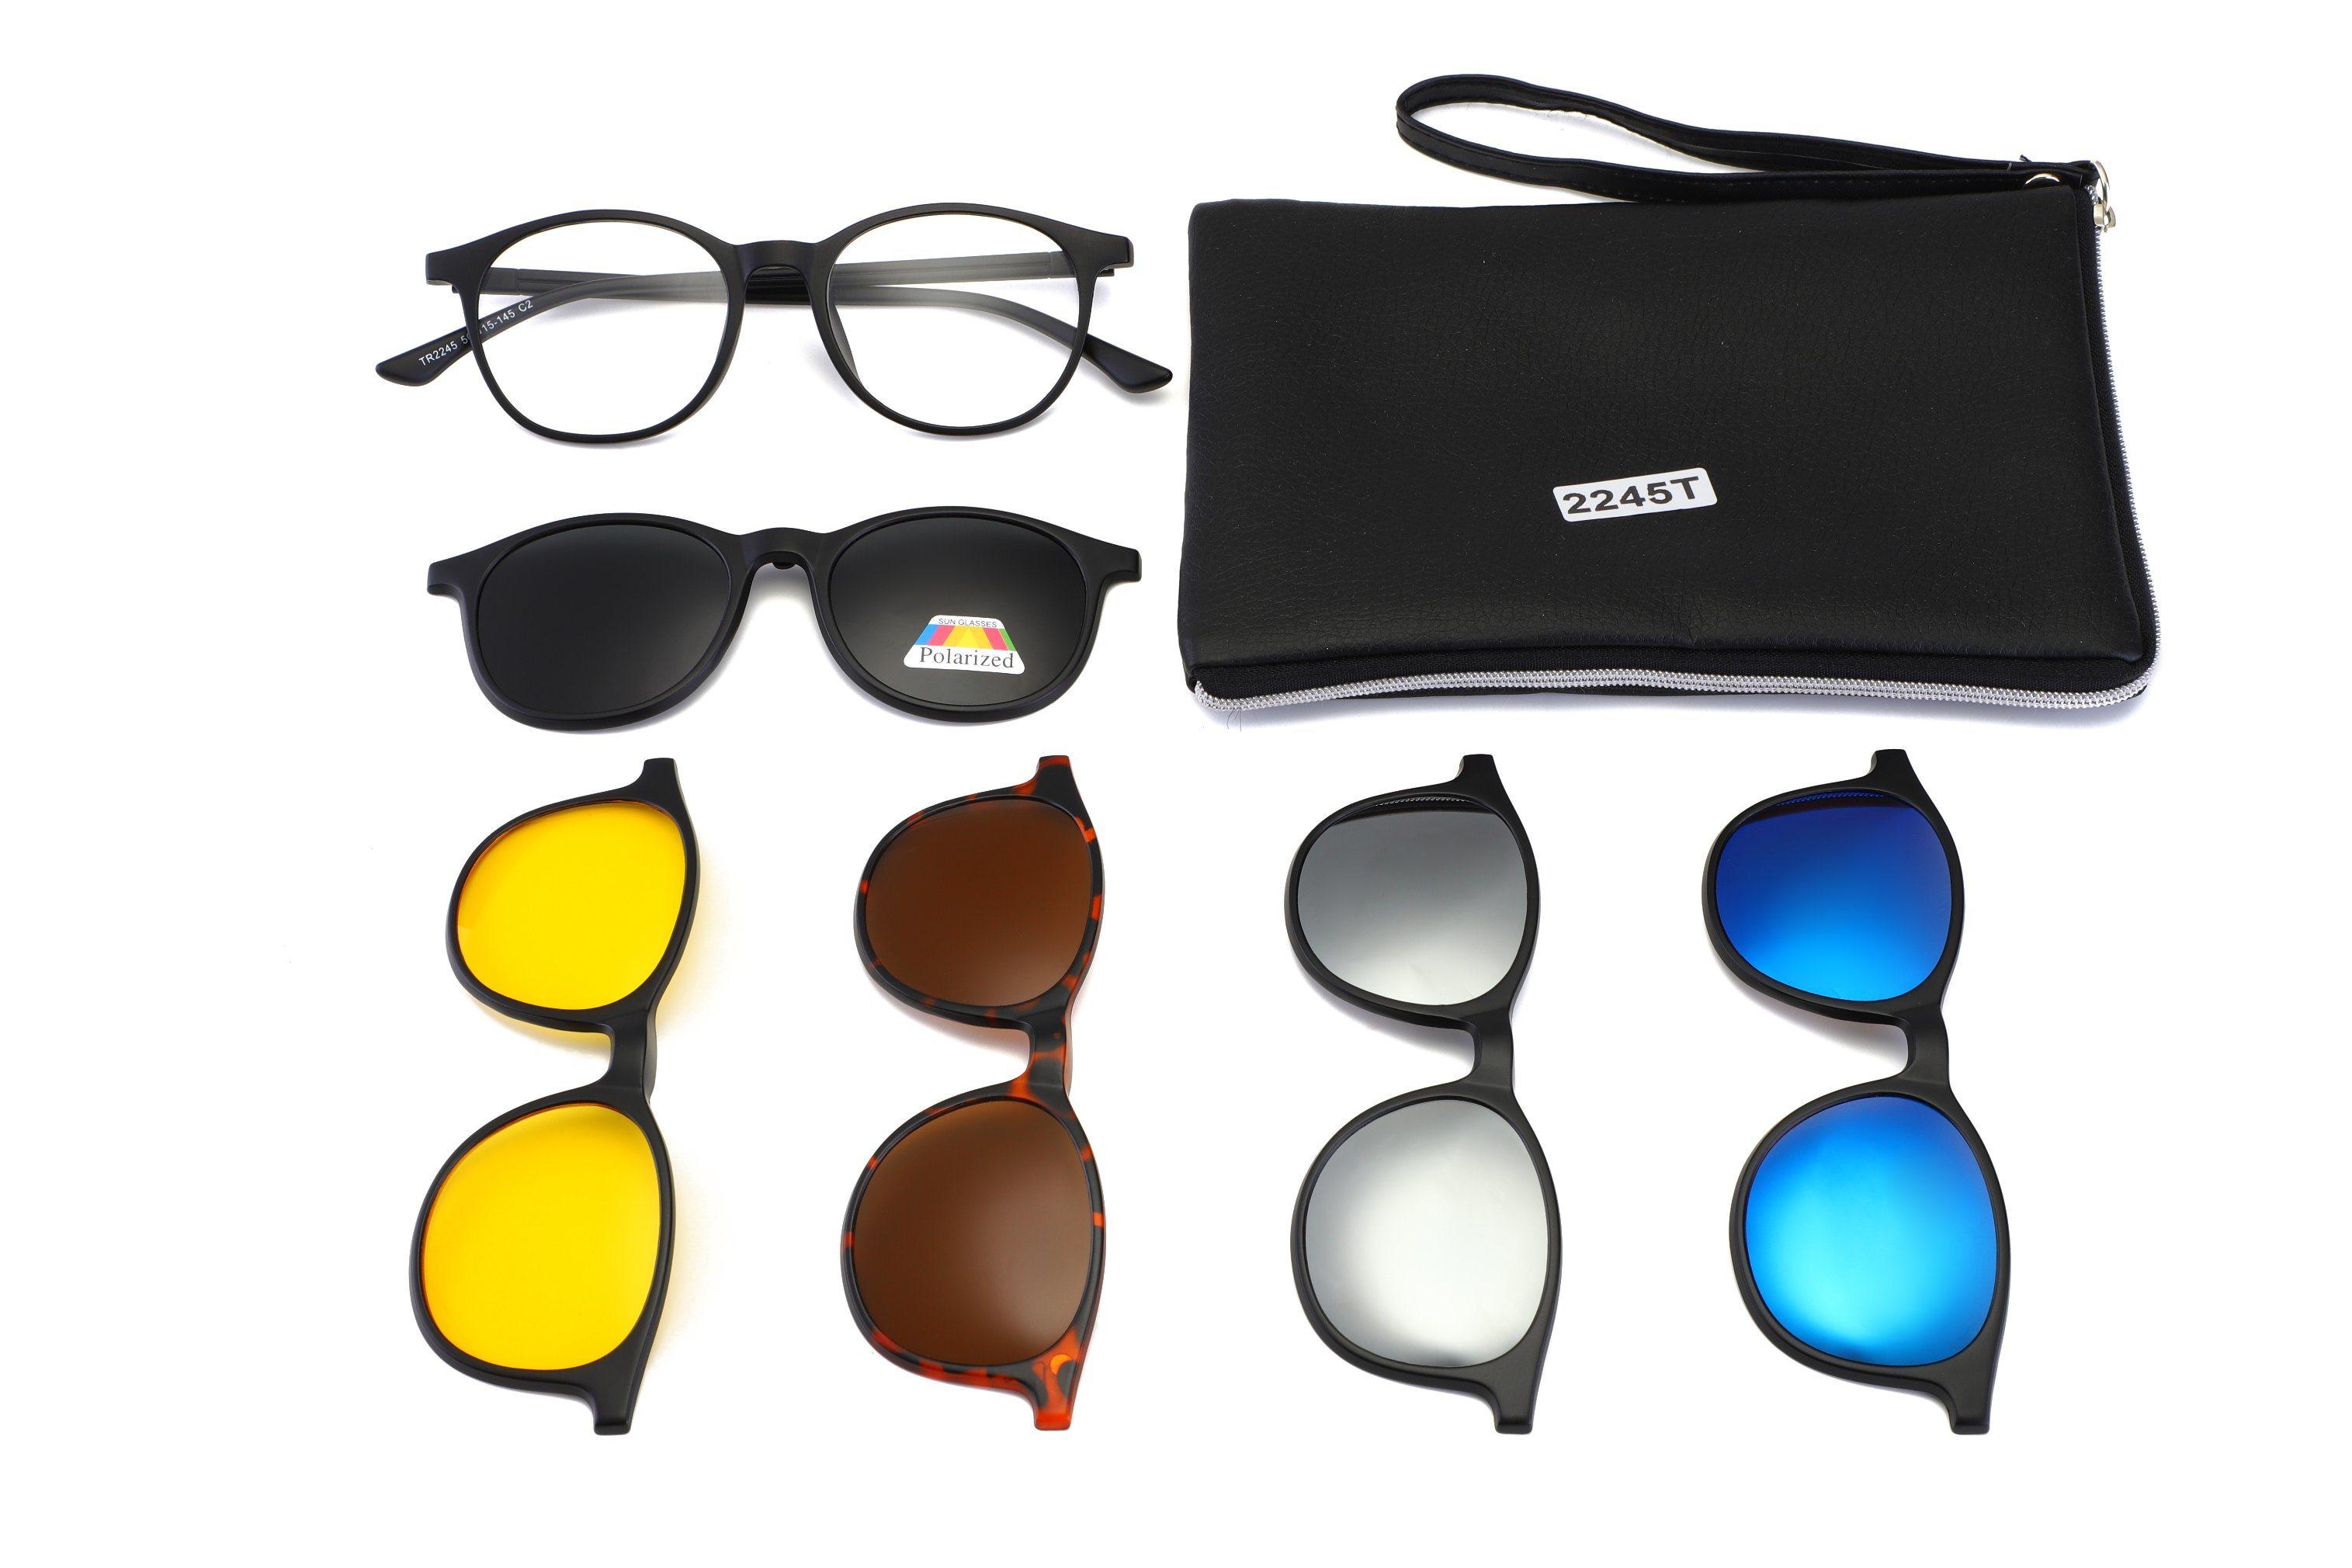 9919eb7038 Wholesales Tr90 Optical Frames Unisex Polarized Lens Magnetic Clip on  Sunglasses